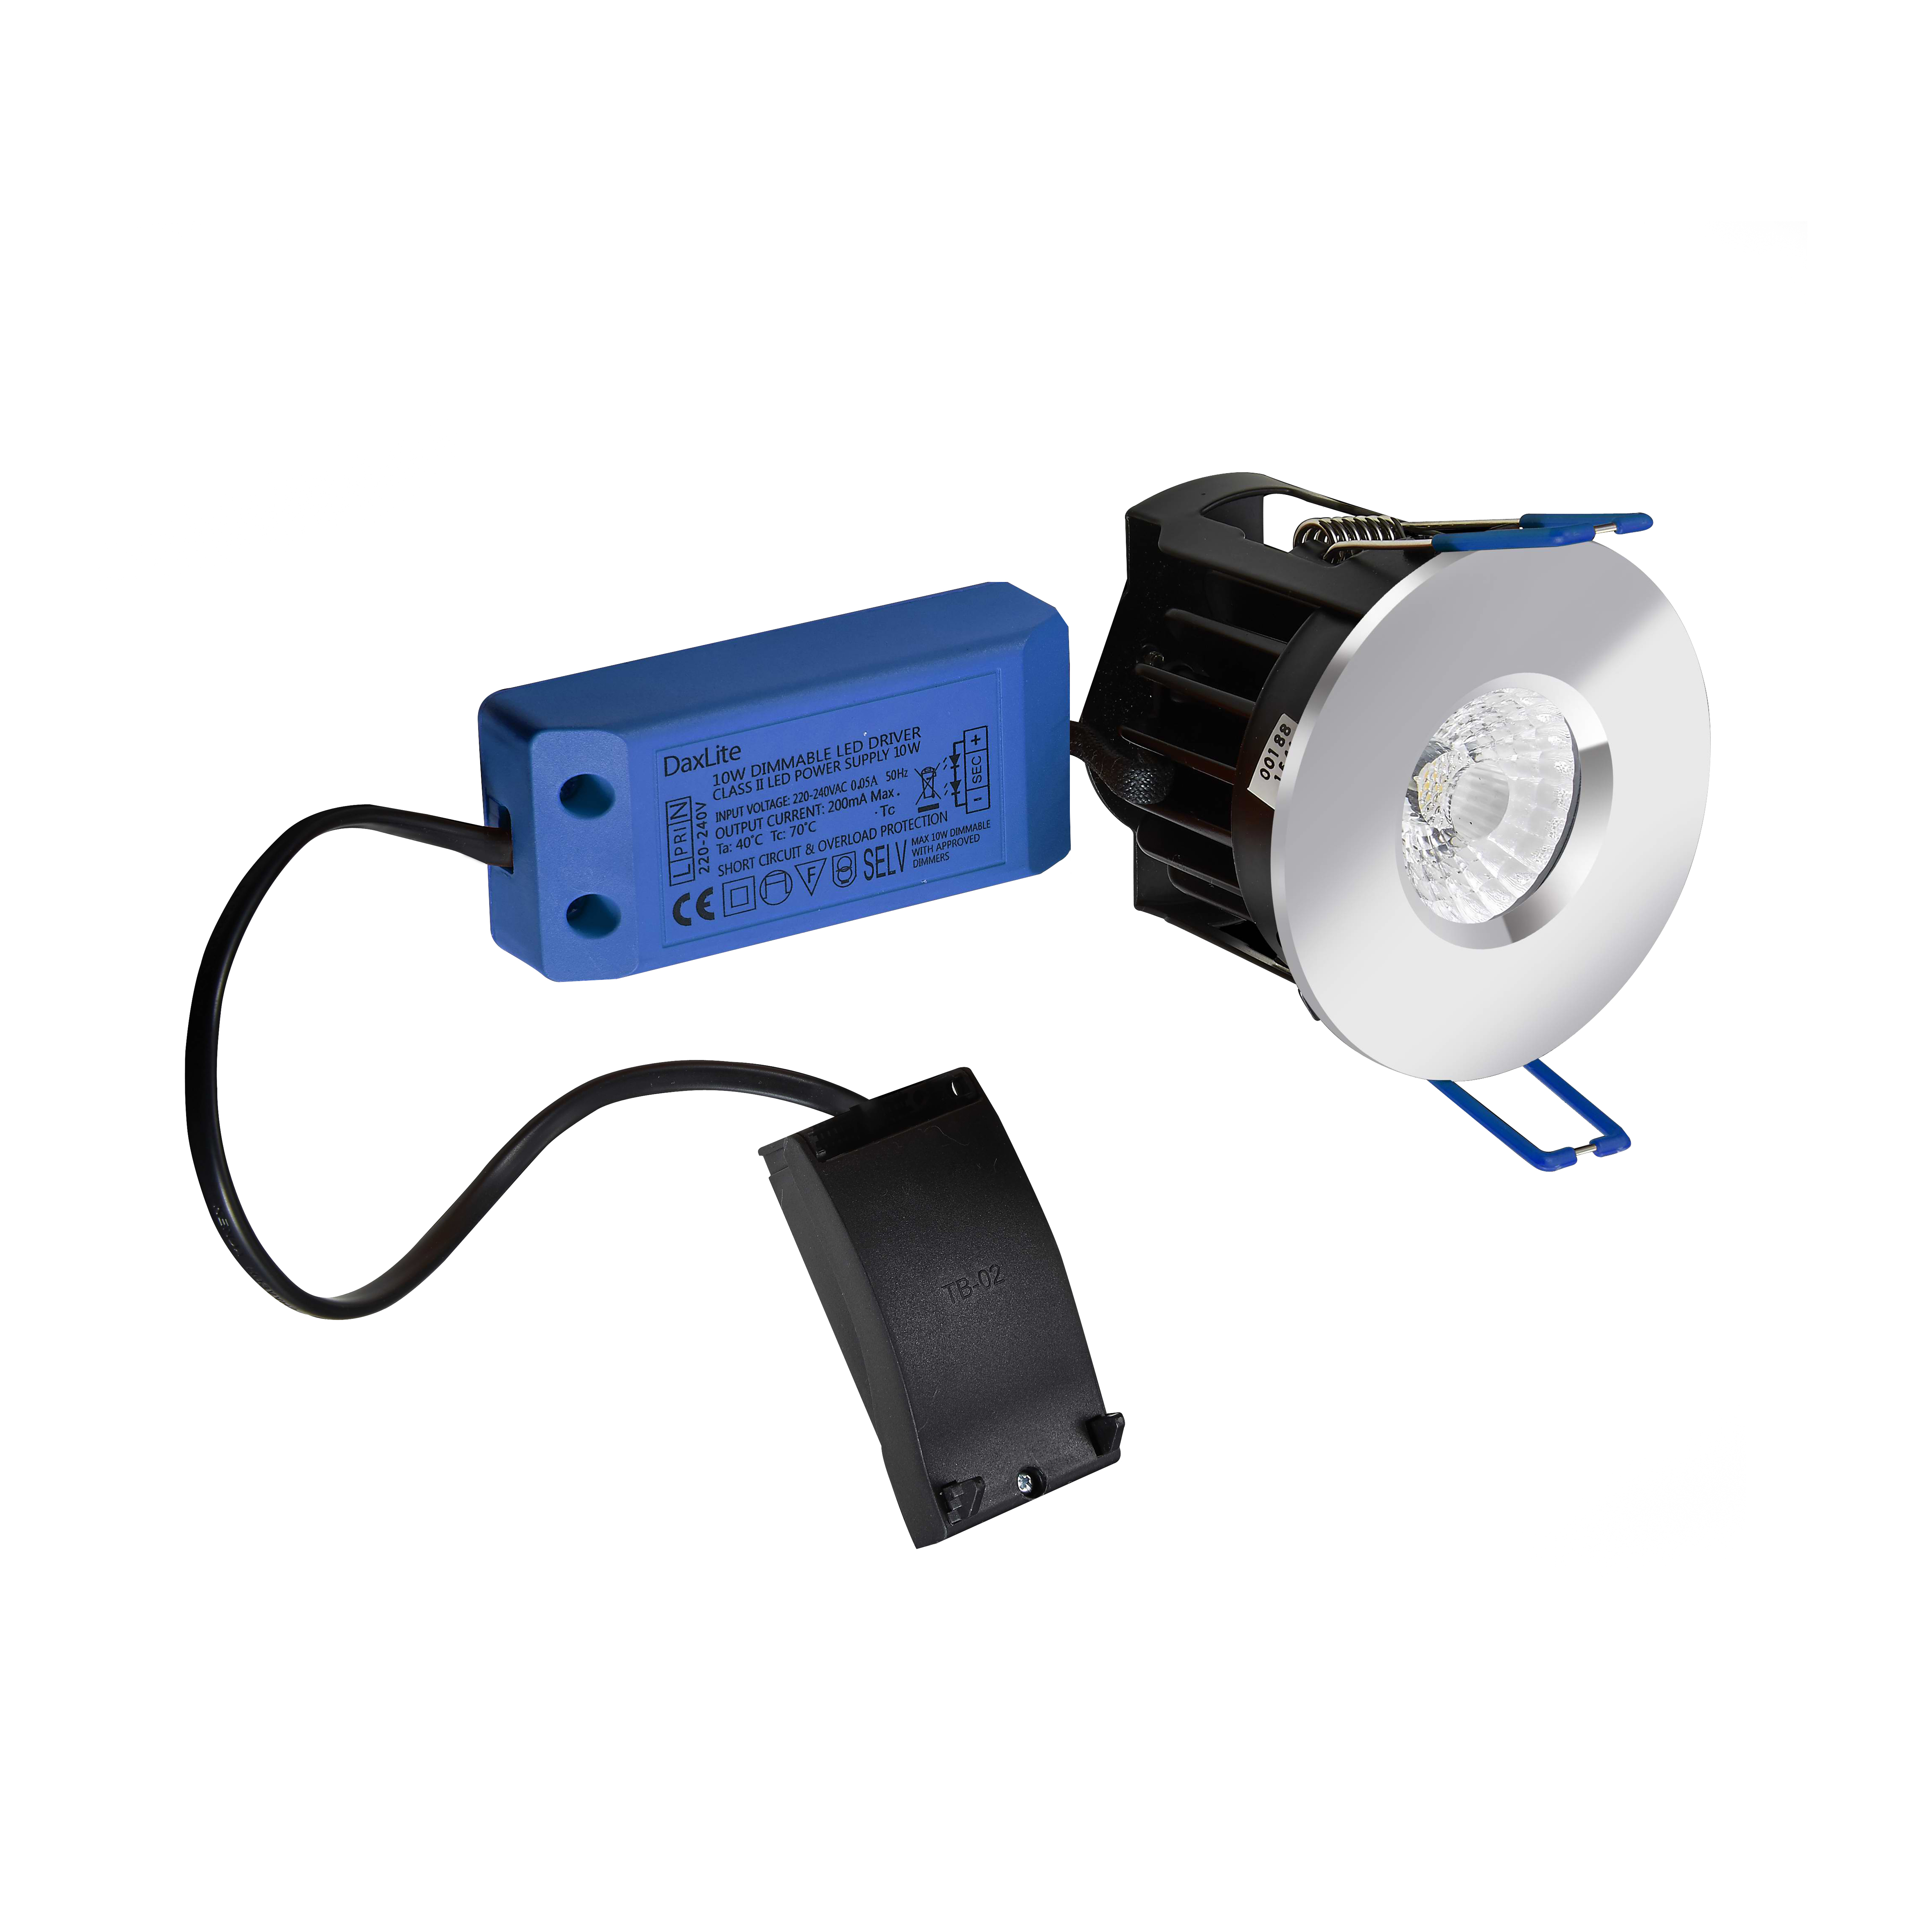 Dax DXBD310 LED Downlight 3000K 10W Whi